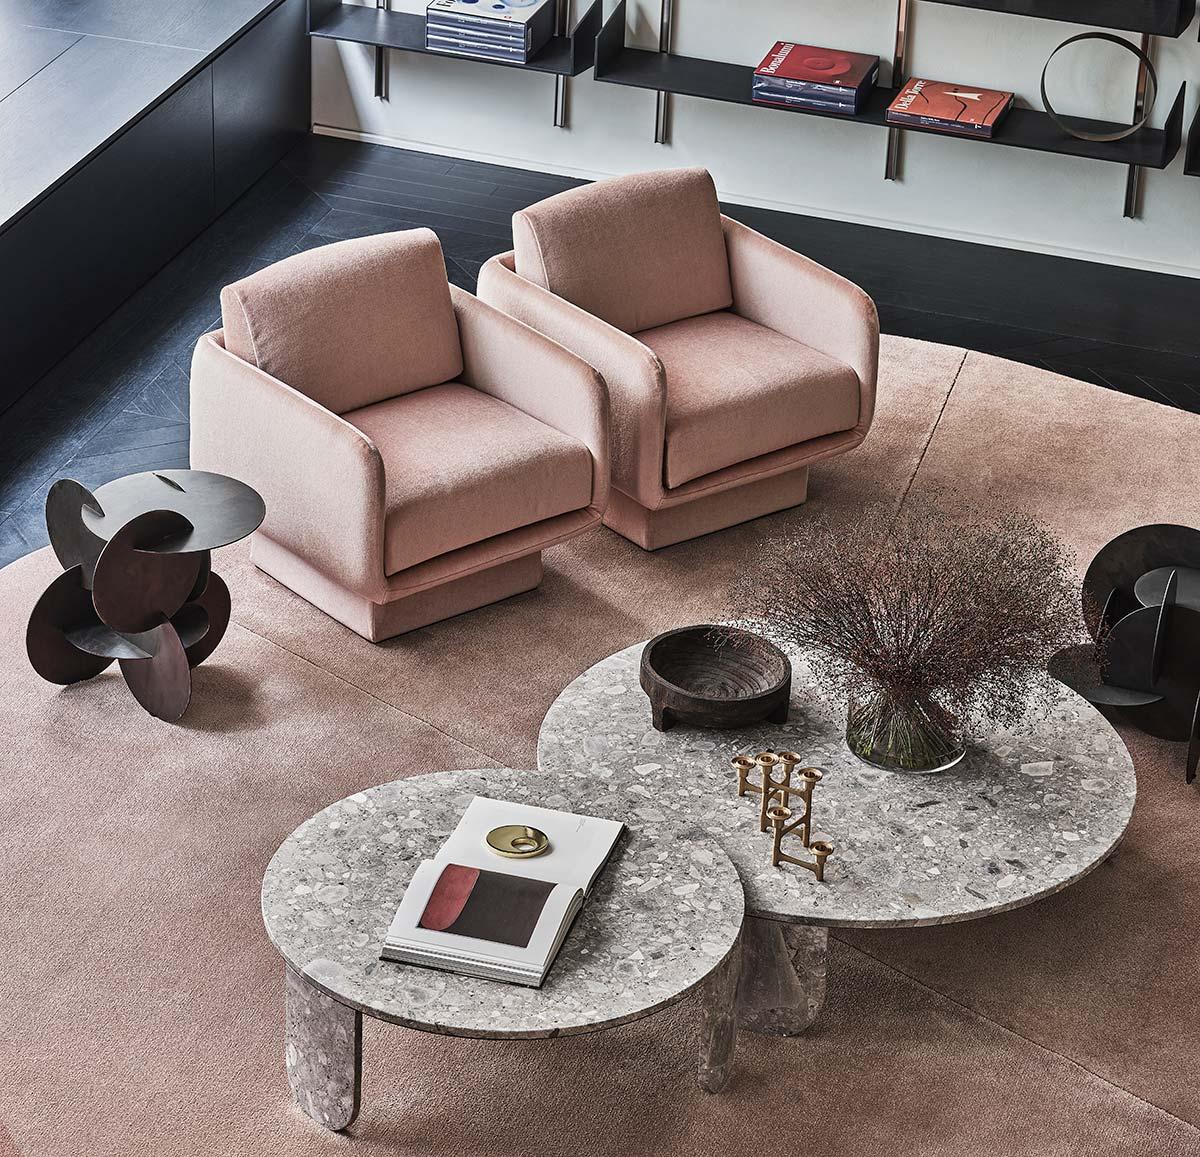 Lilas by Gallotti&Radice, Design Dainelli Studio - Photo © Matteo Imbriani